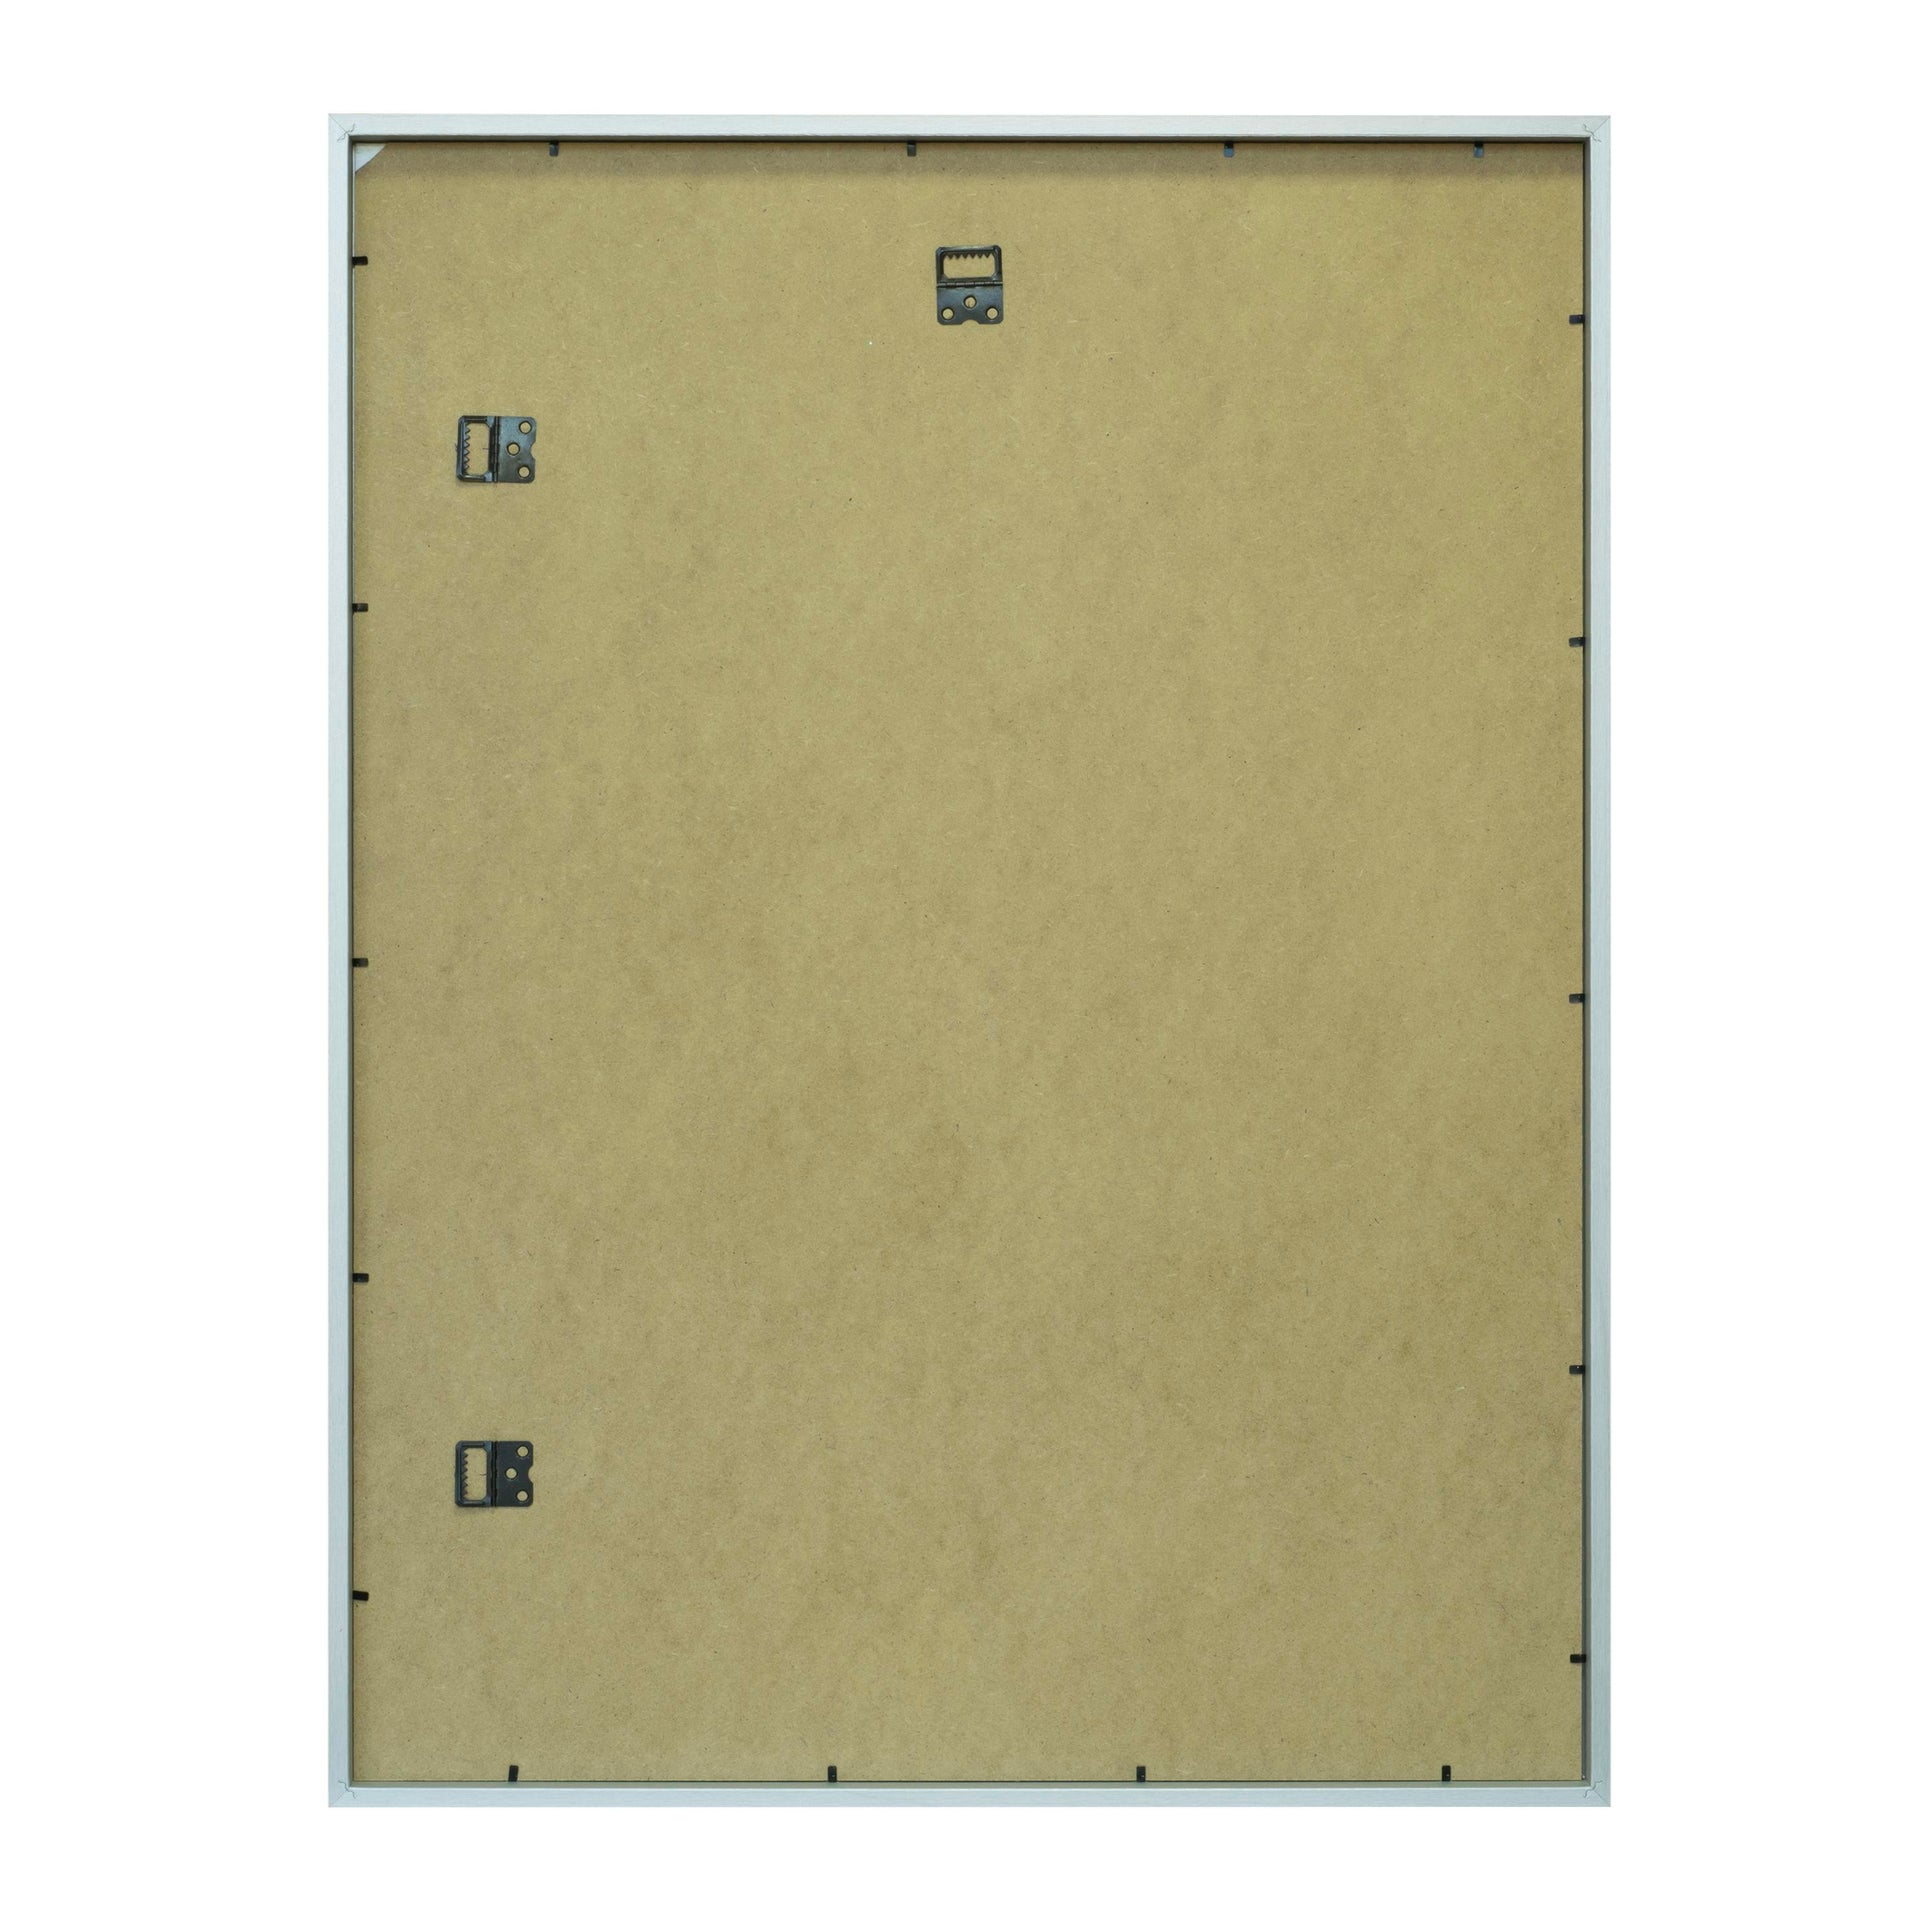 Cornice con passe-partout Inspire milo argento 70x100 cm - 2